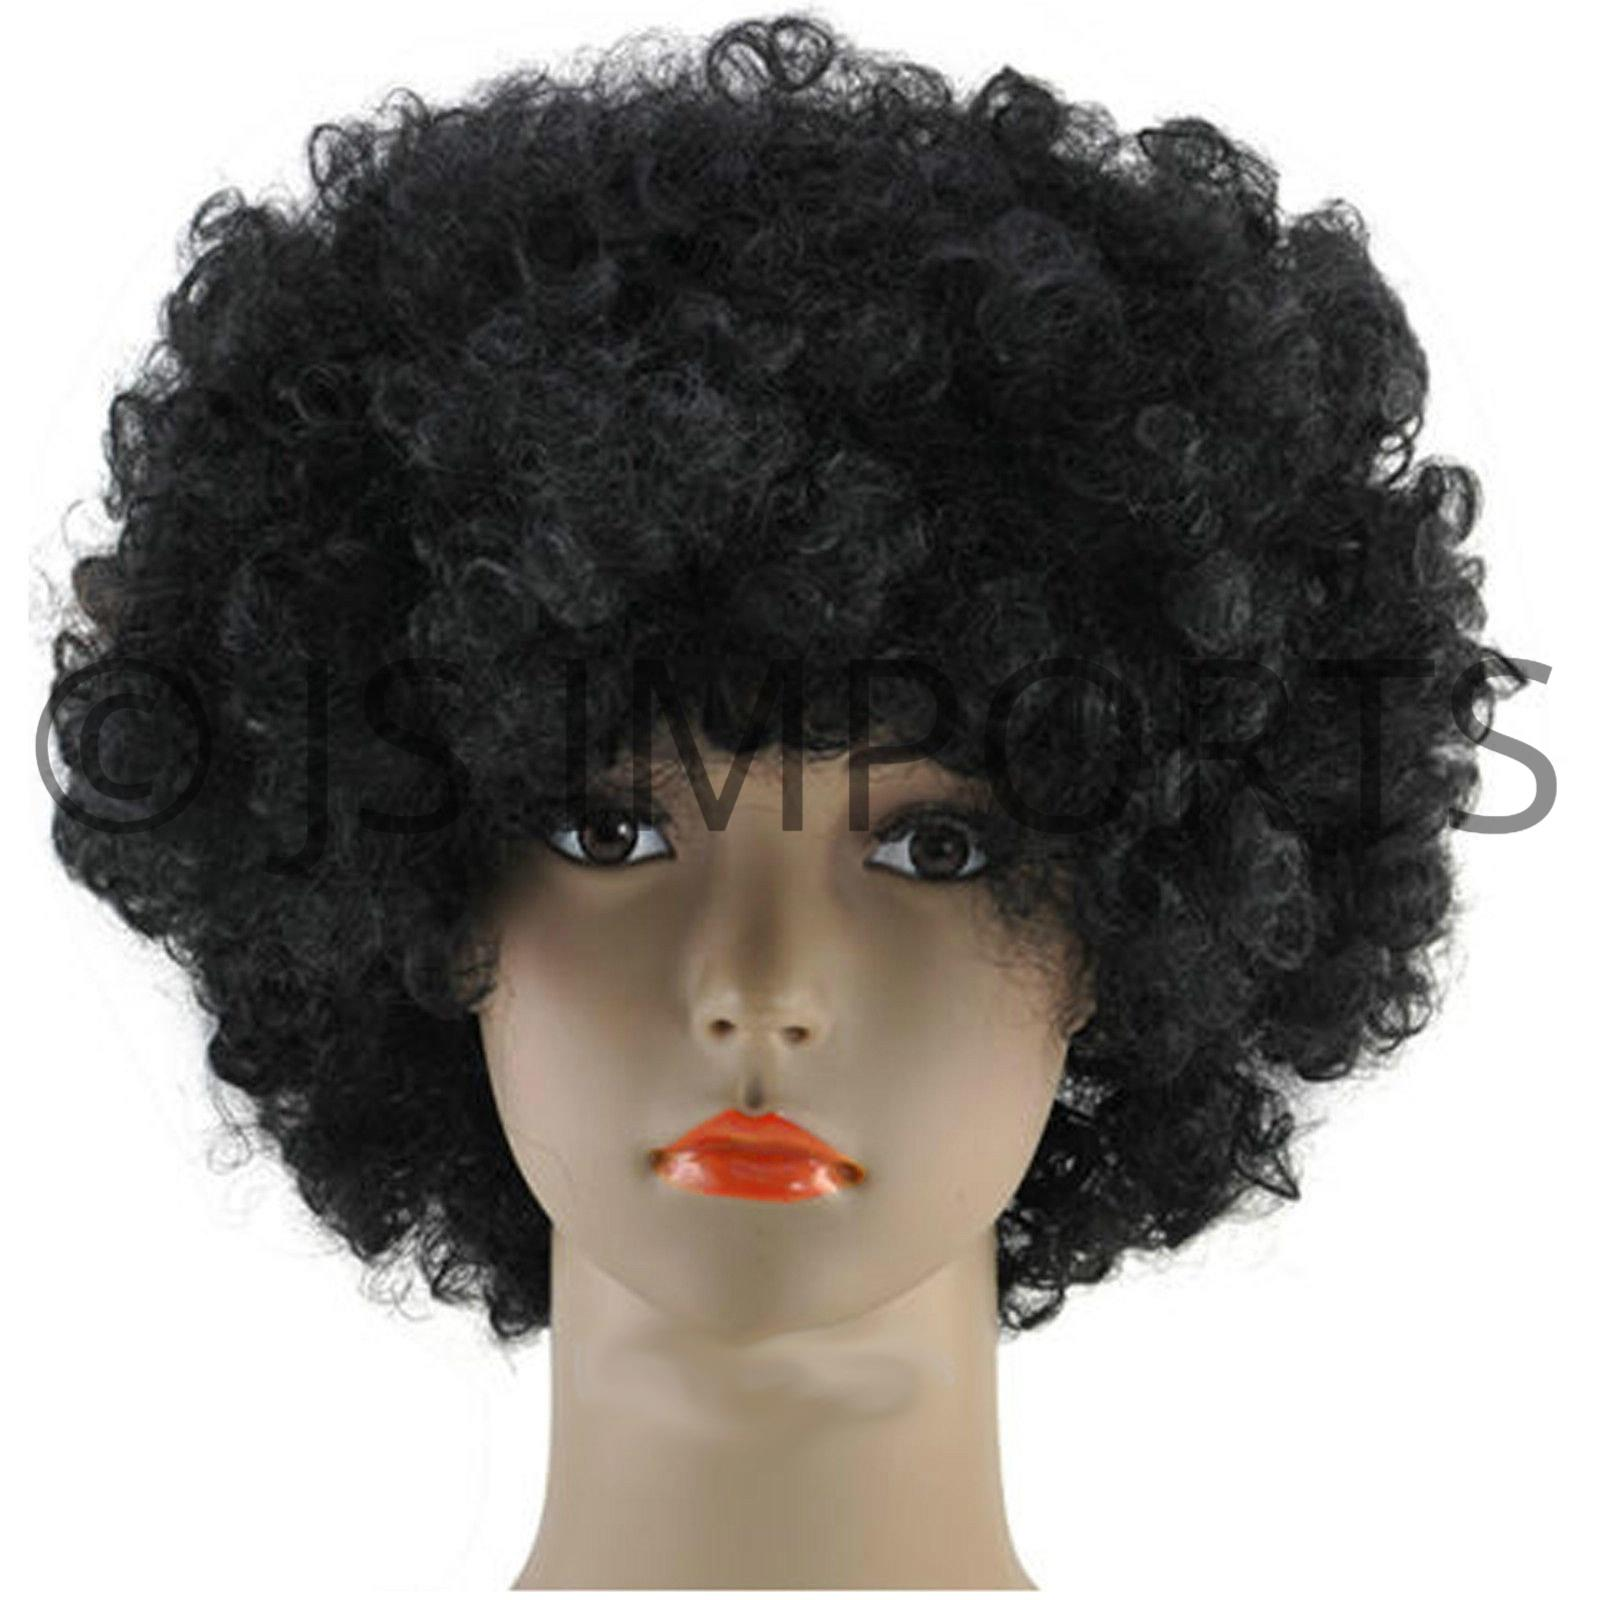 Wholesale Black Afro Wigs  4e7859f6b70c